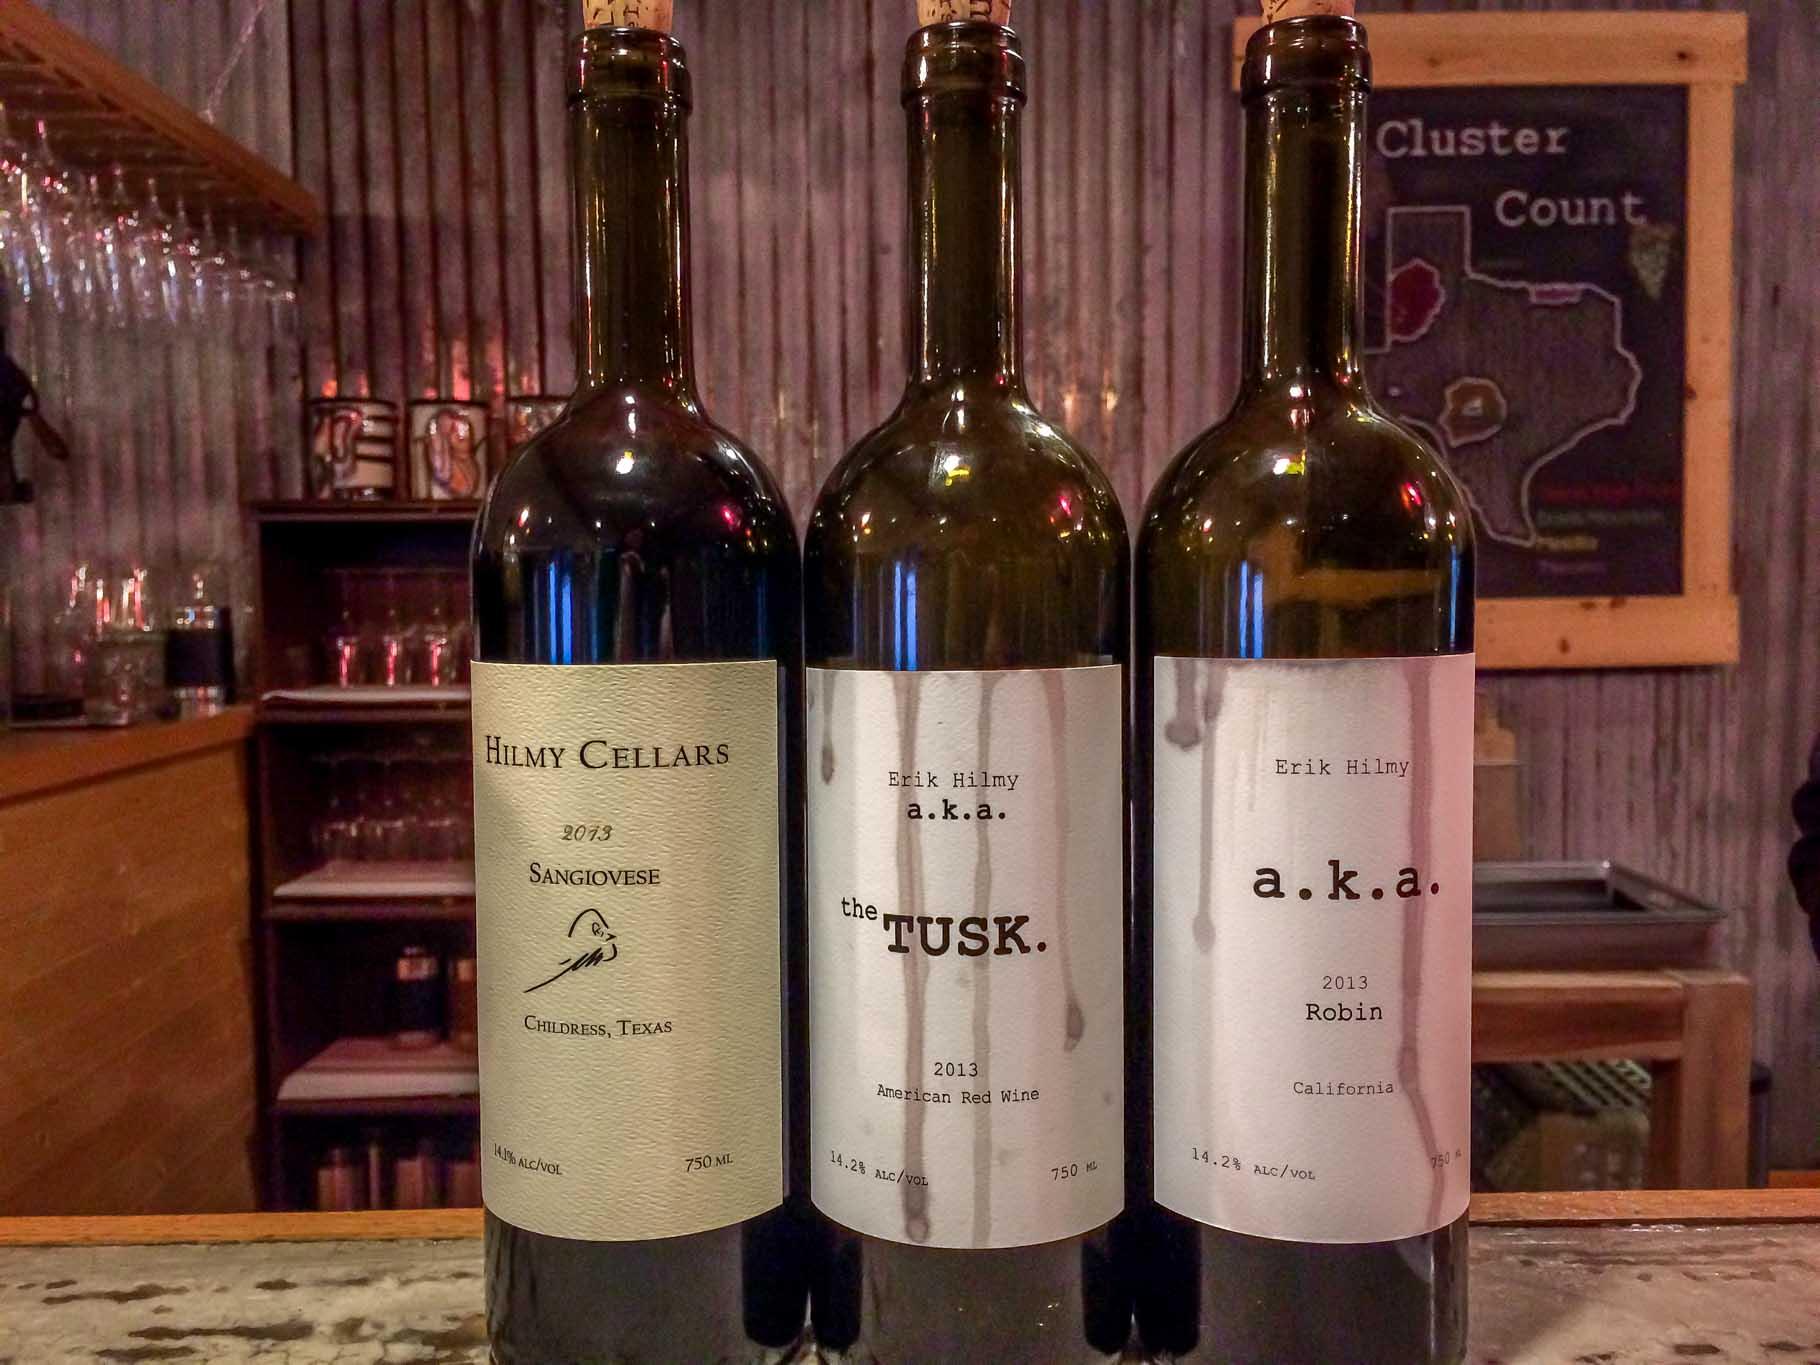 Three wine bottles on a bar